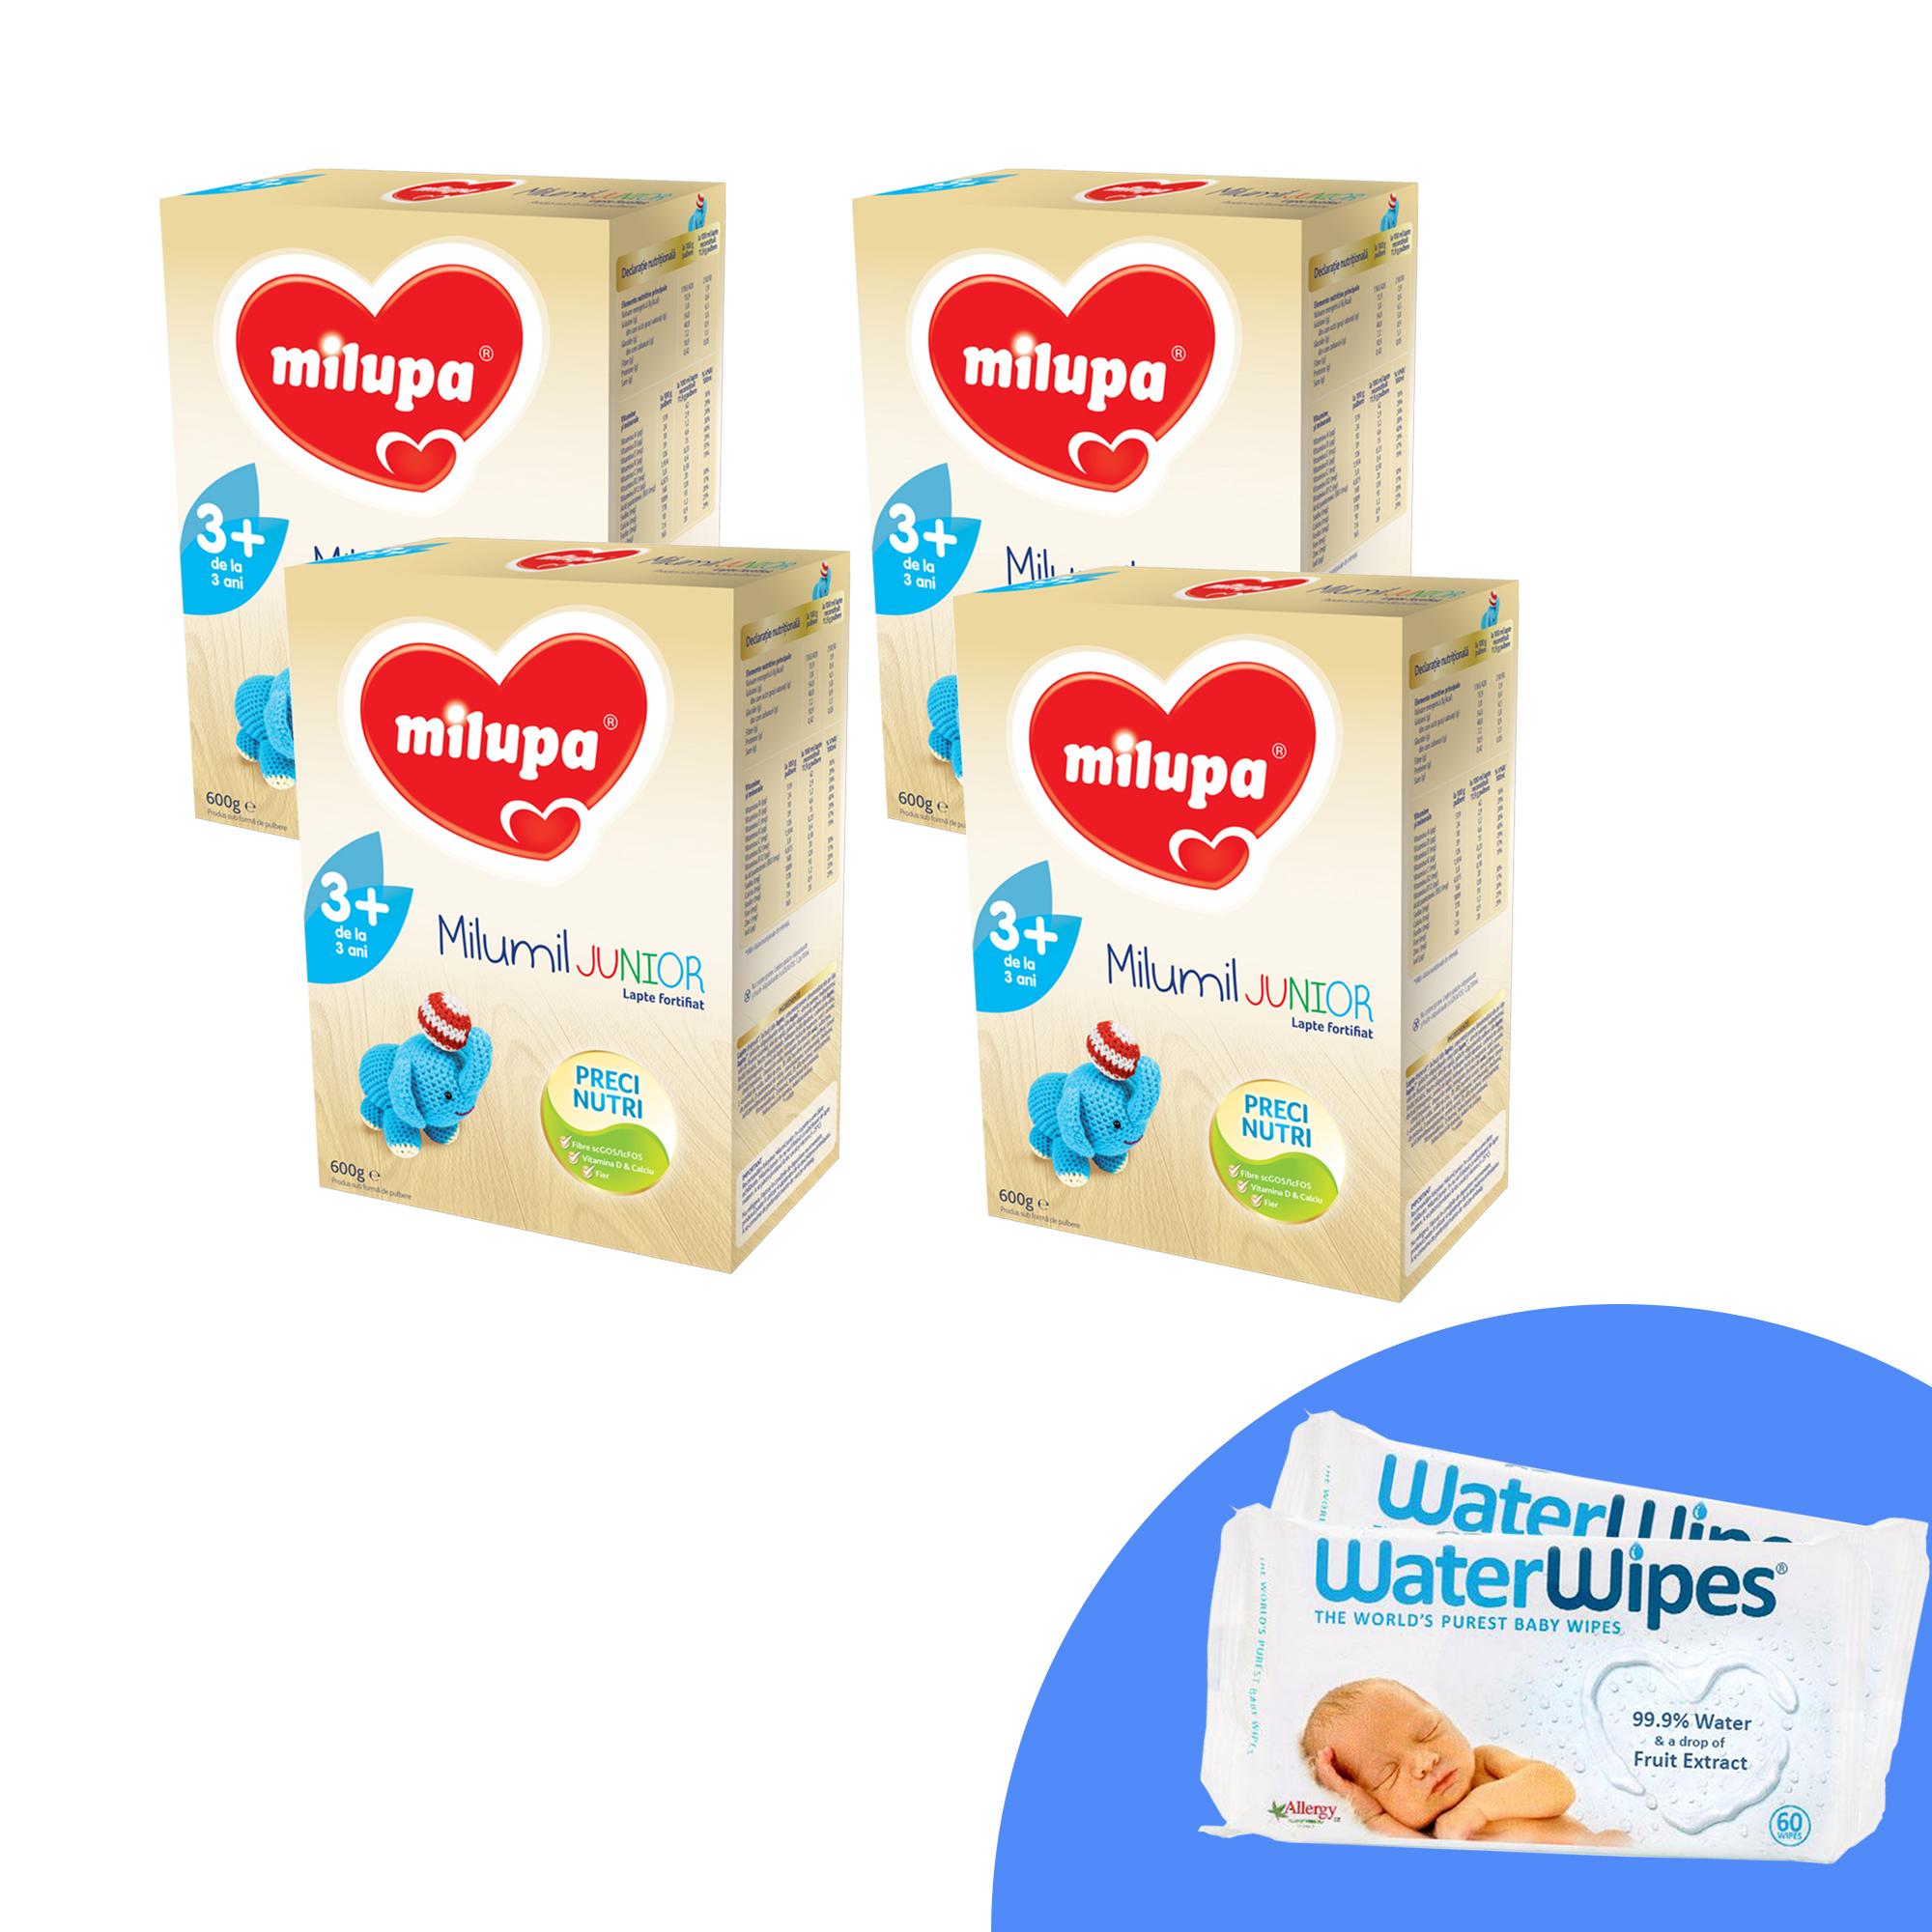 Pachet 4 x Lapte praf Milupa Milumil Junior 3+, 600g, 3ani+ si 2 x Servetele umede pentru bebelusi, WaterWipes, 60 buc